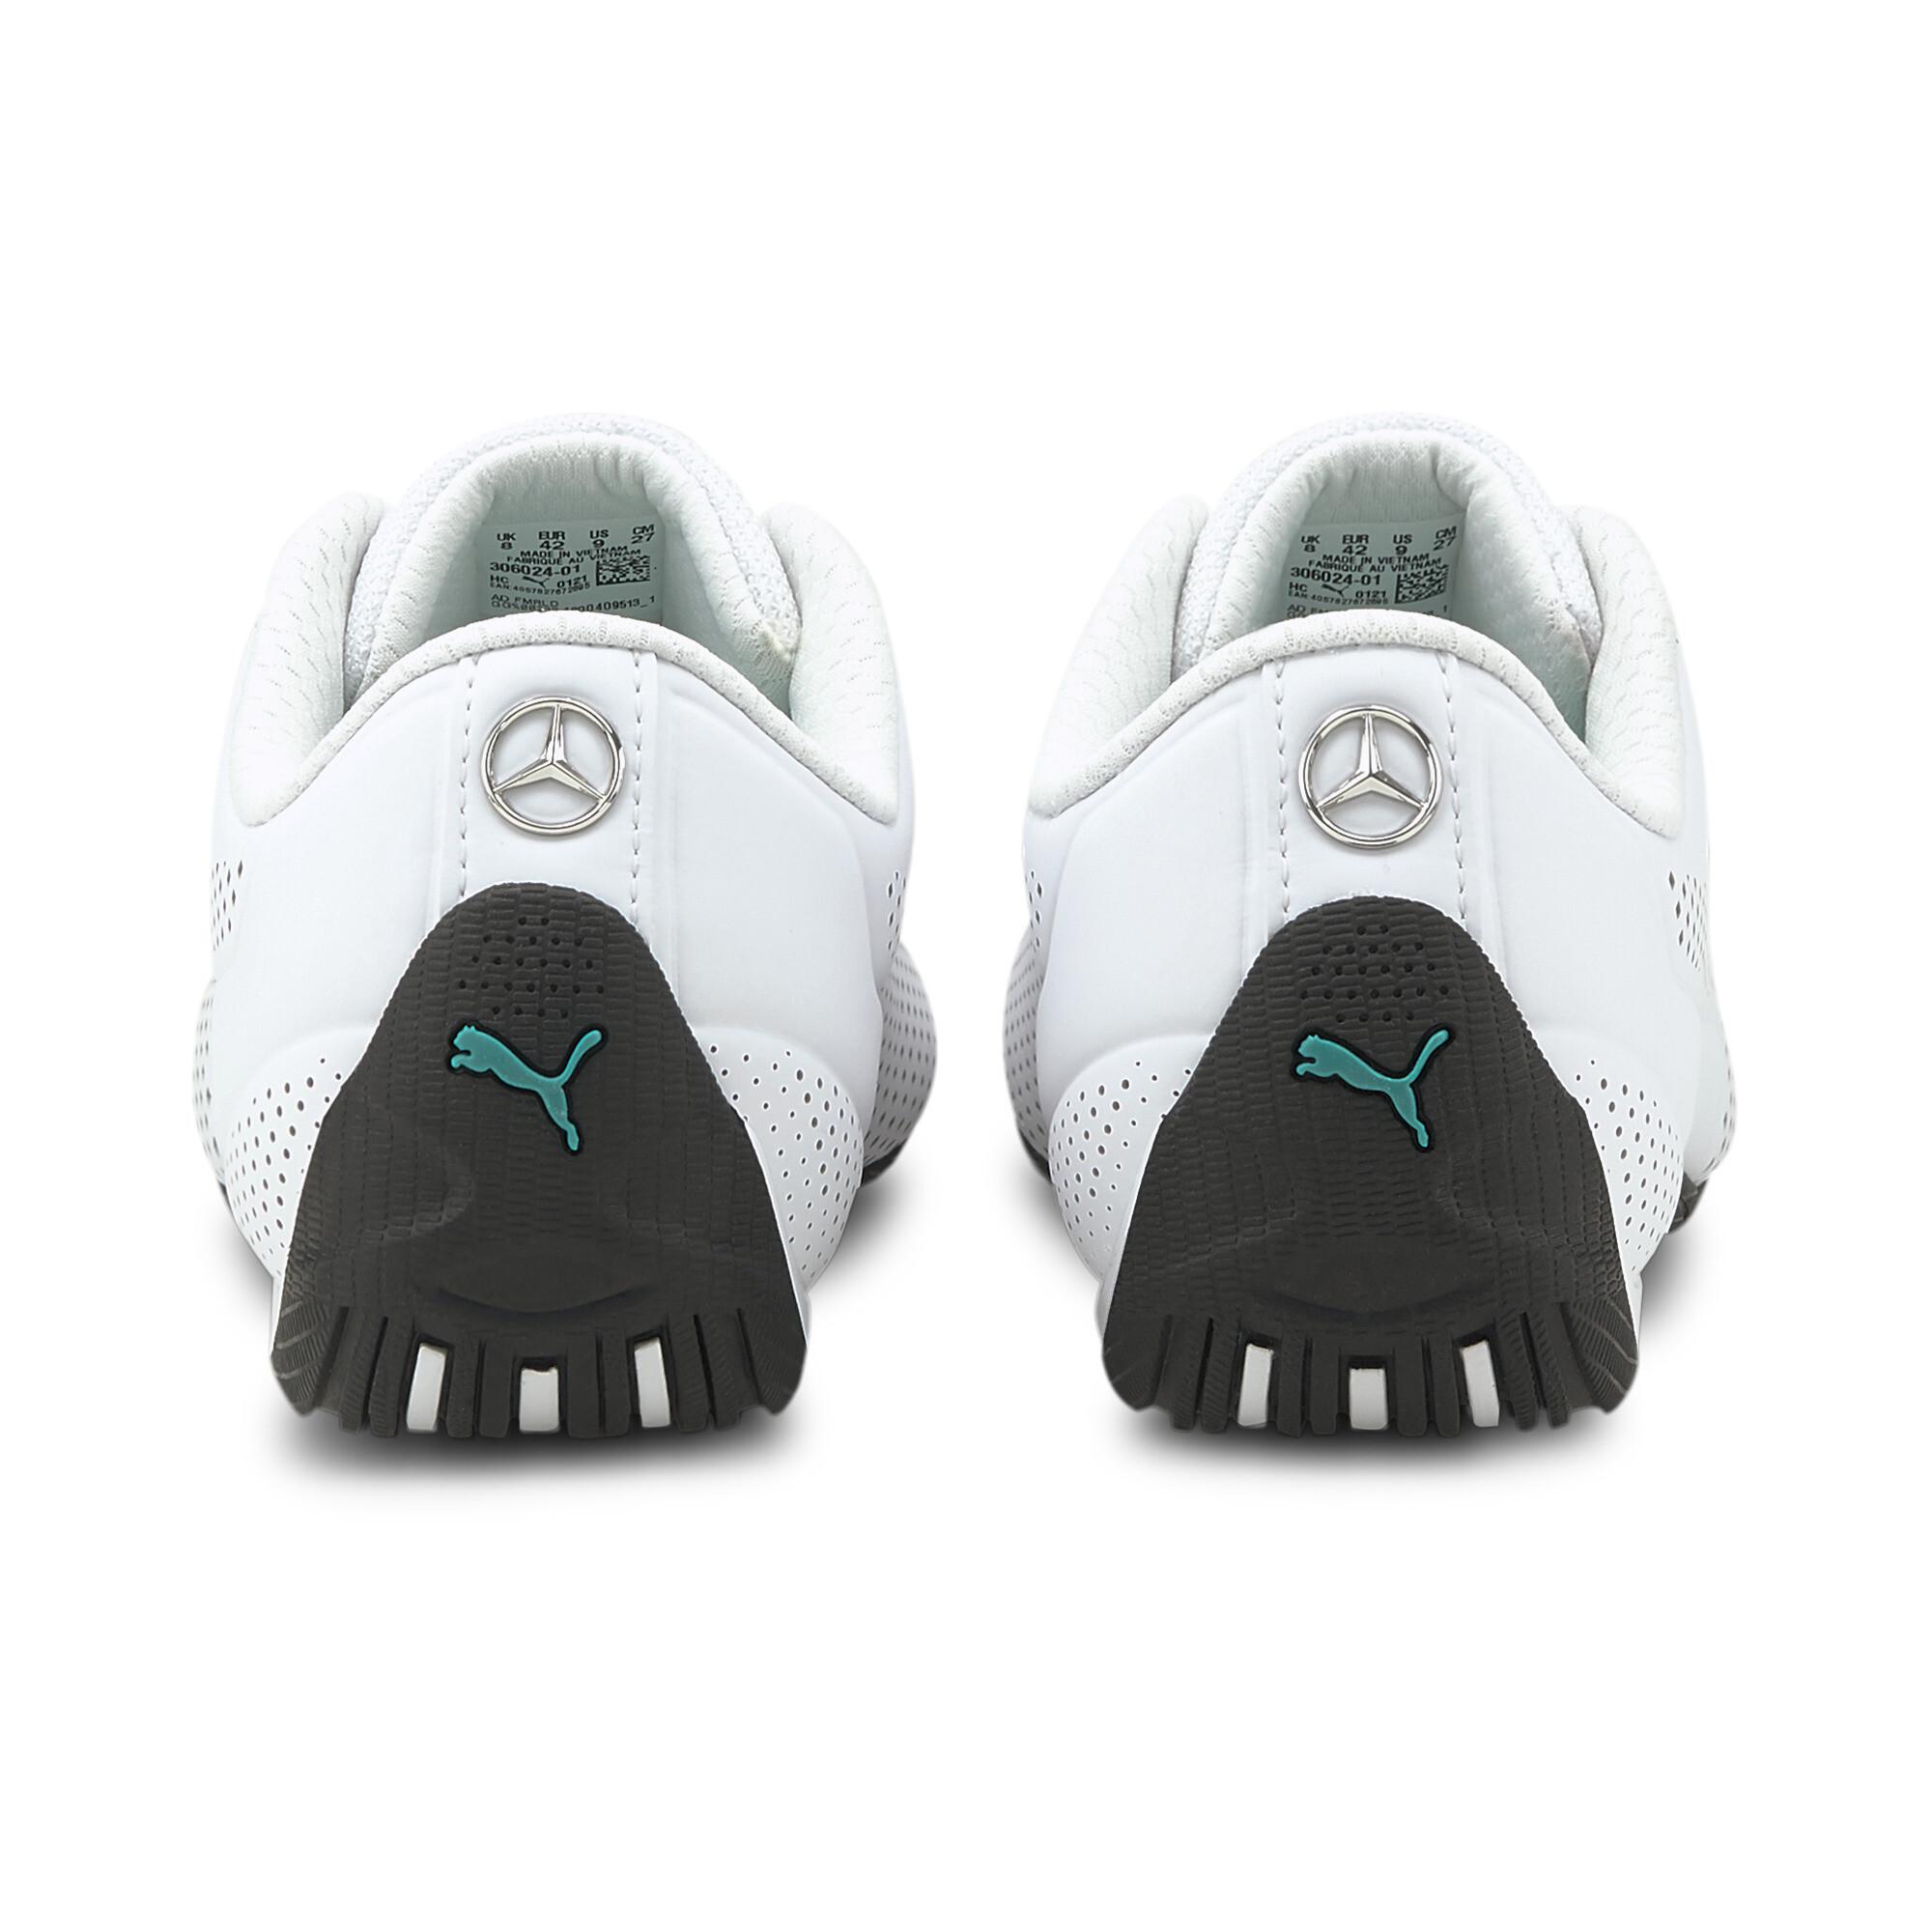 Indexbild 15 - PUMA MERCEDES AMG PETRONAS Drift Cat Ultra Sneaker Unisex Schuhe Neu